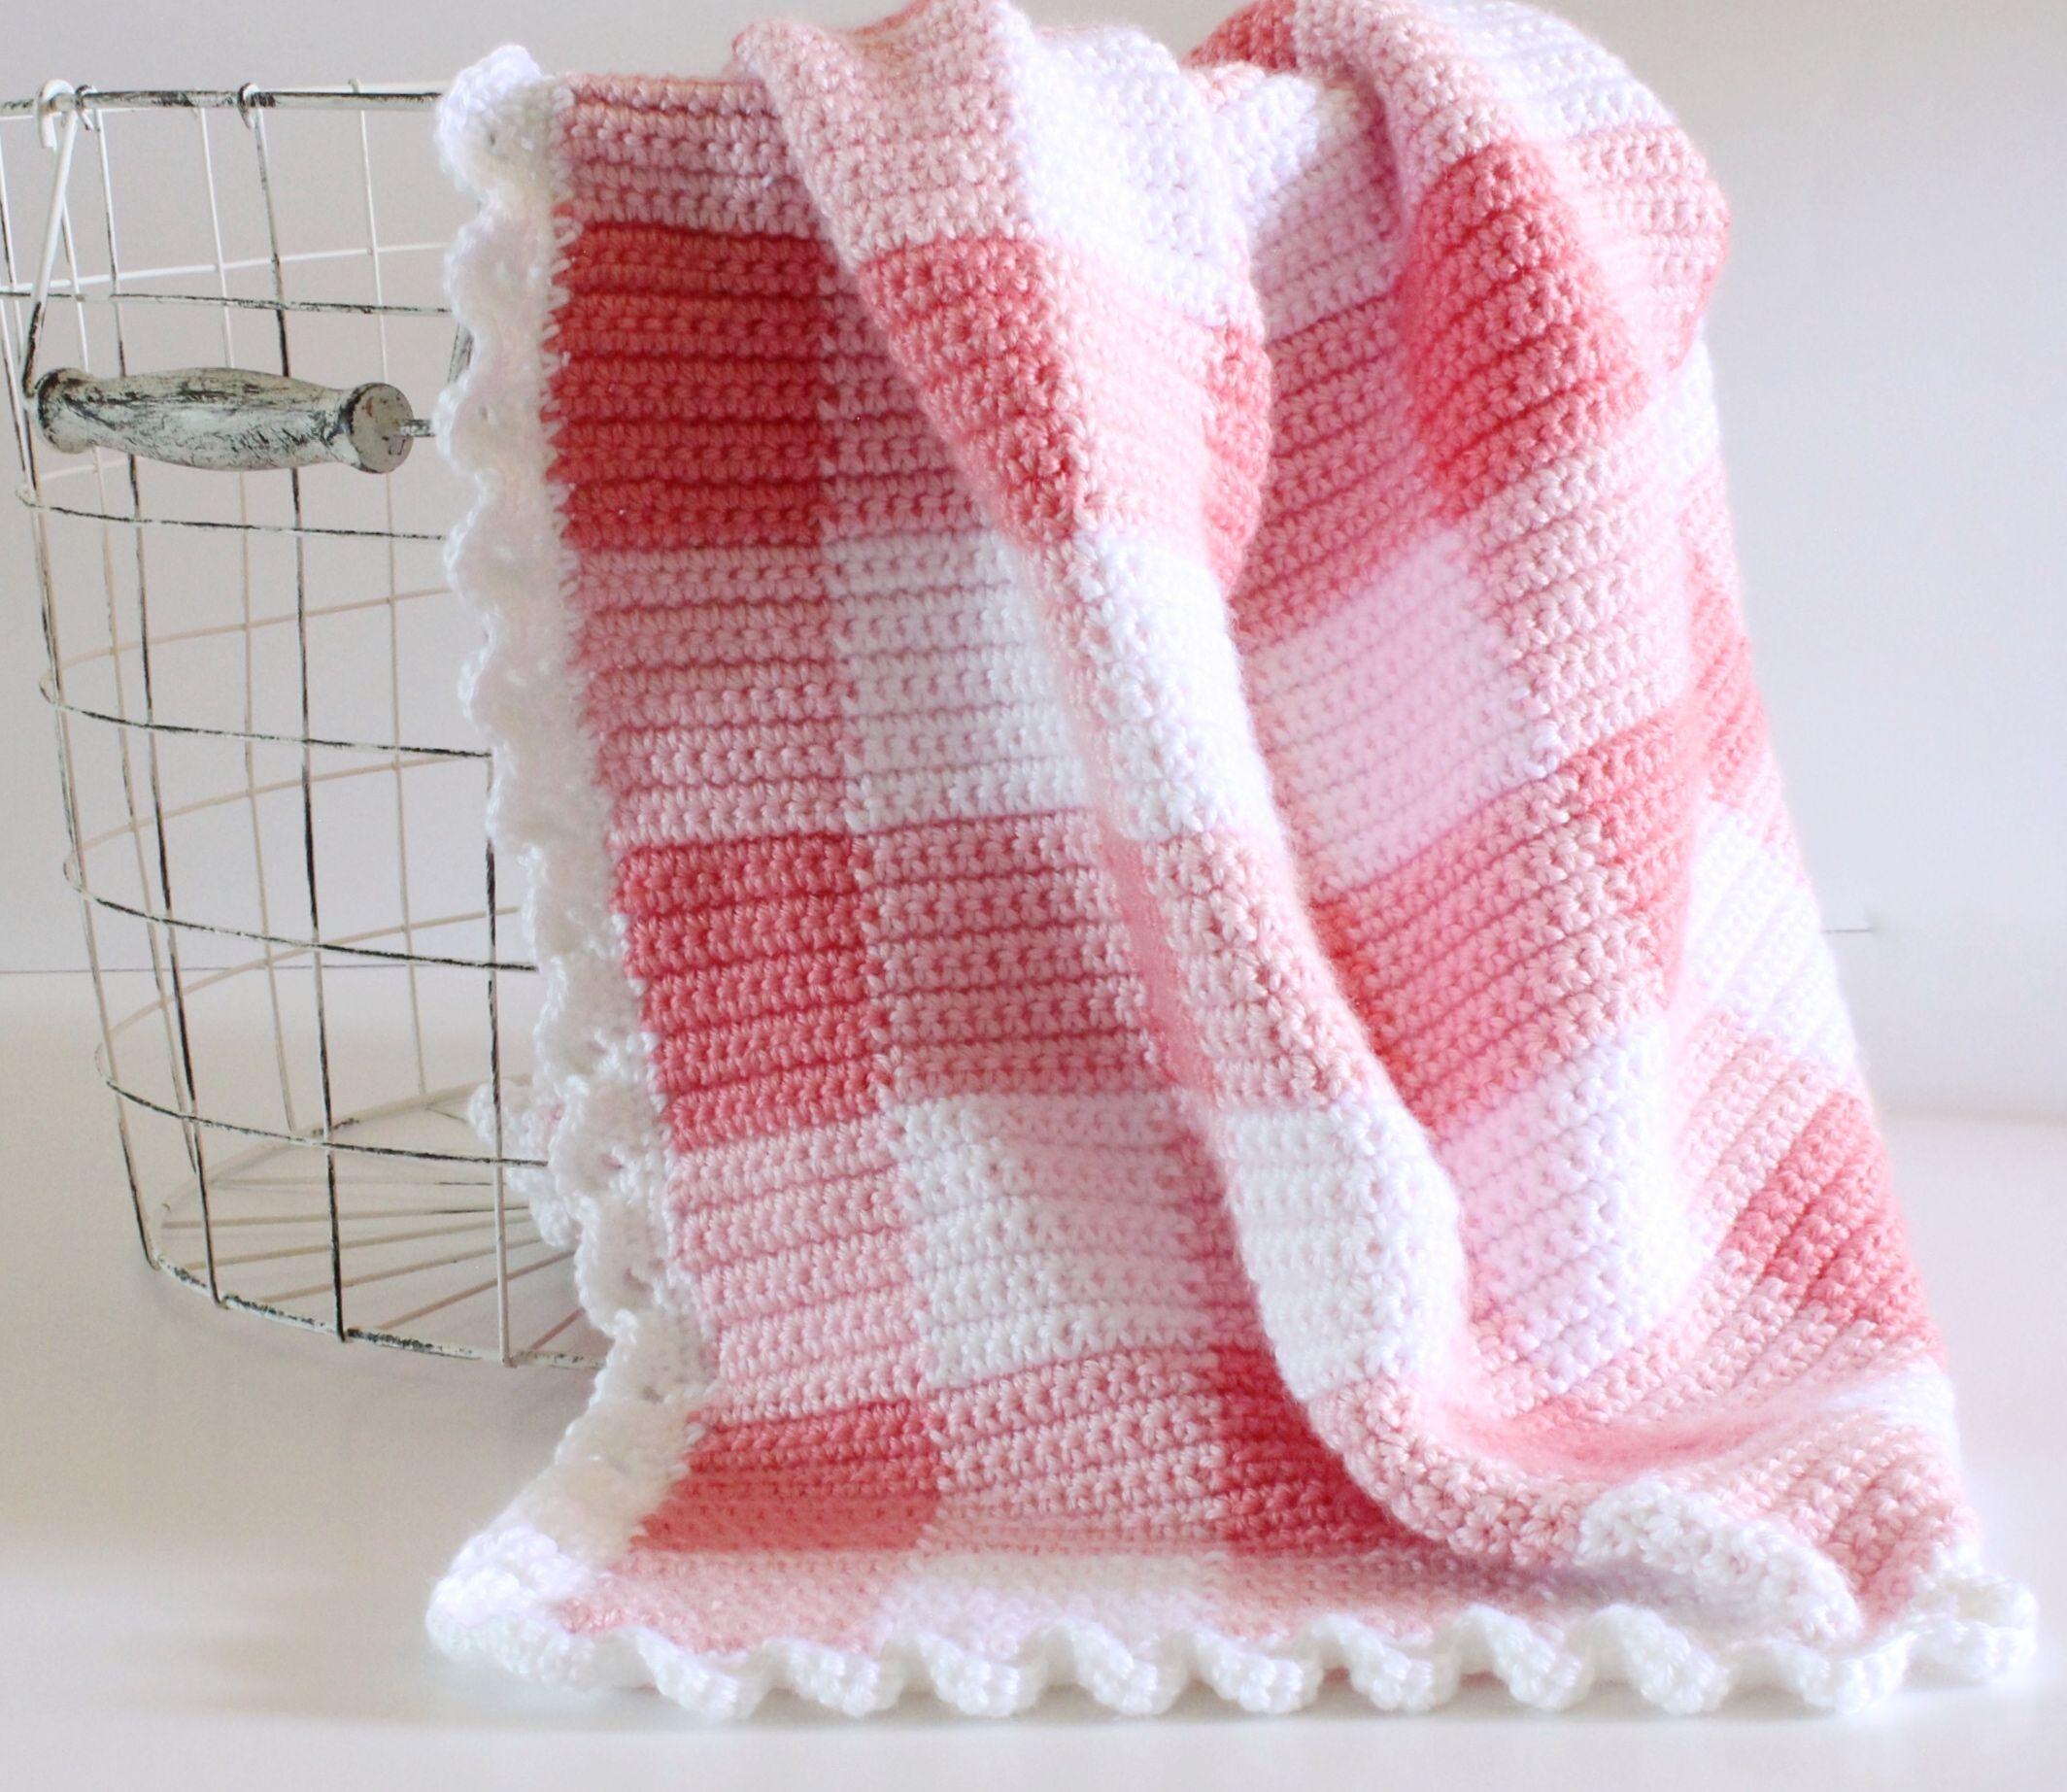 Pink Gingham Crochet Baby Blanket Pattern - Daisy Farm Crafts ...